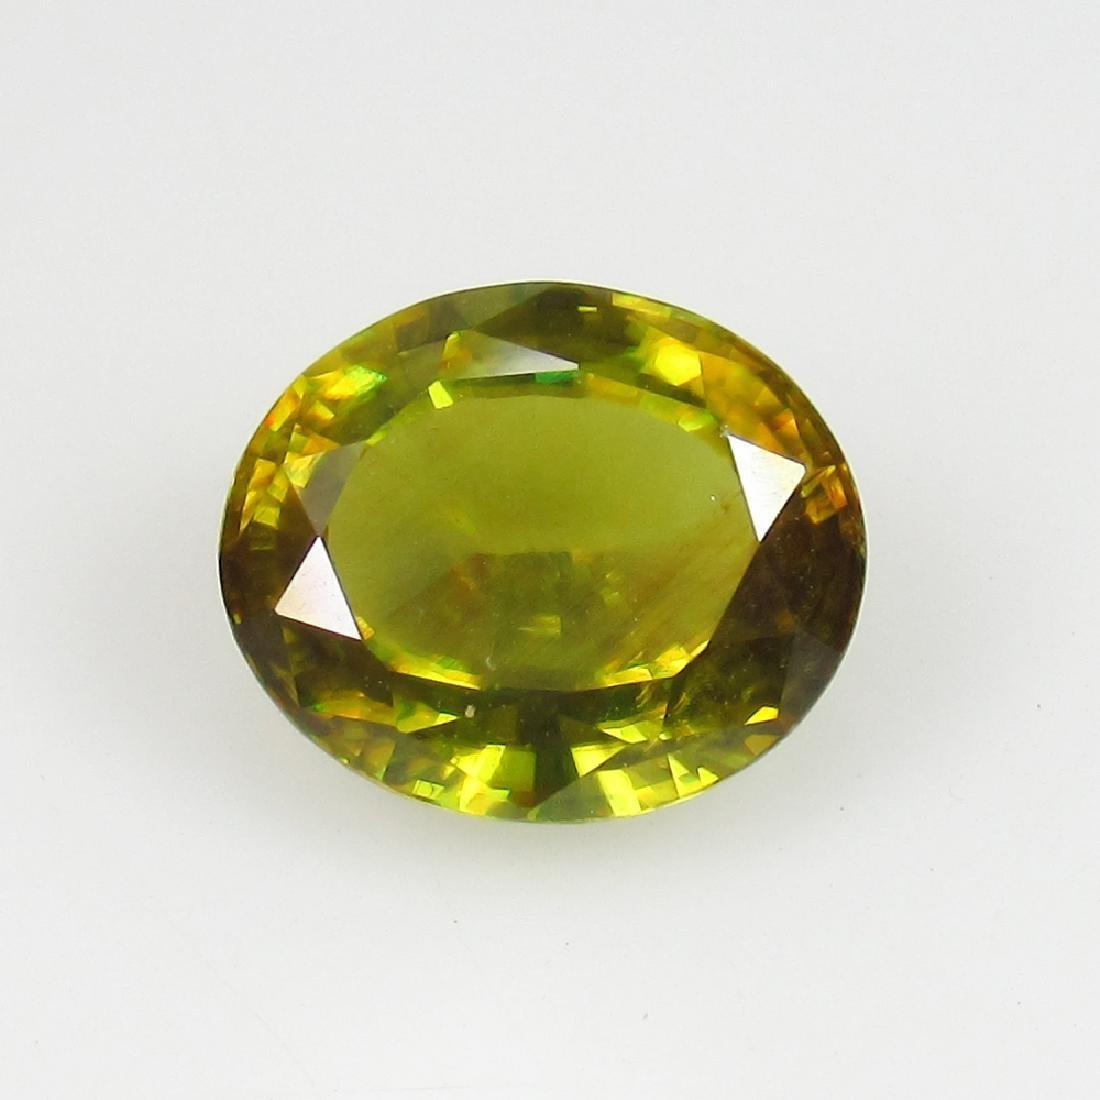 2.08 Ct IGI Certified Genuine Burma Yellowish Green